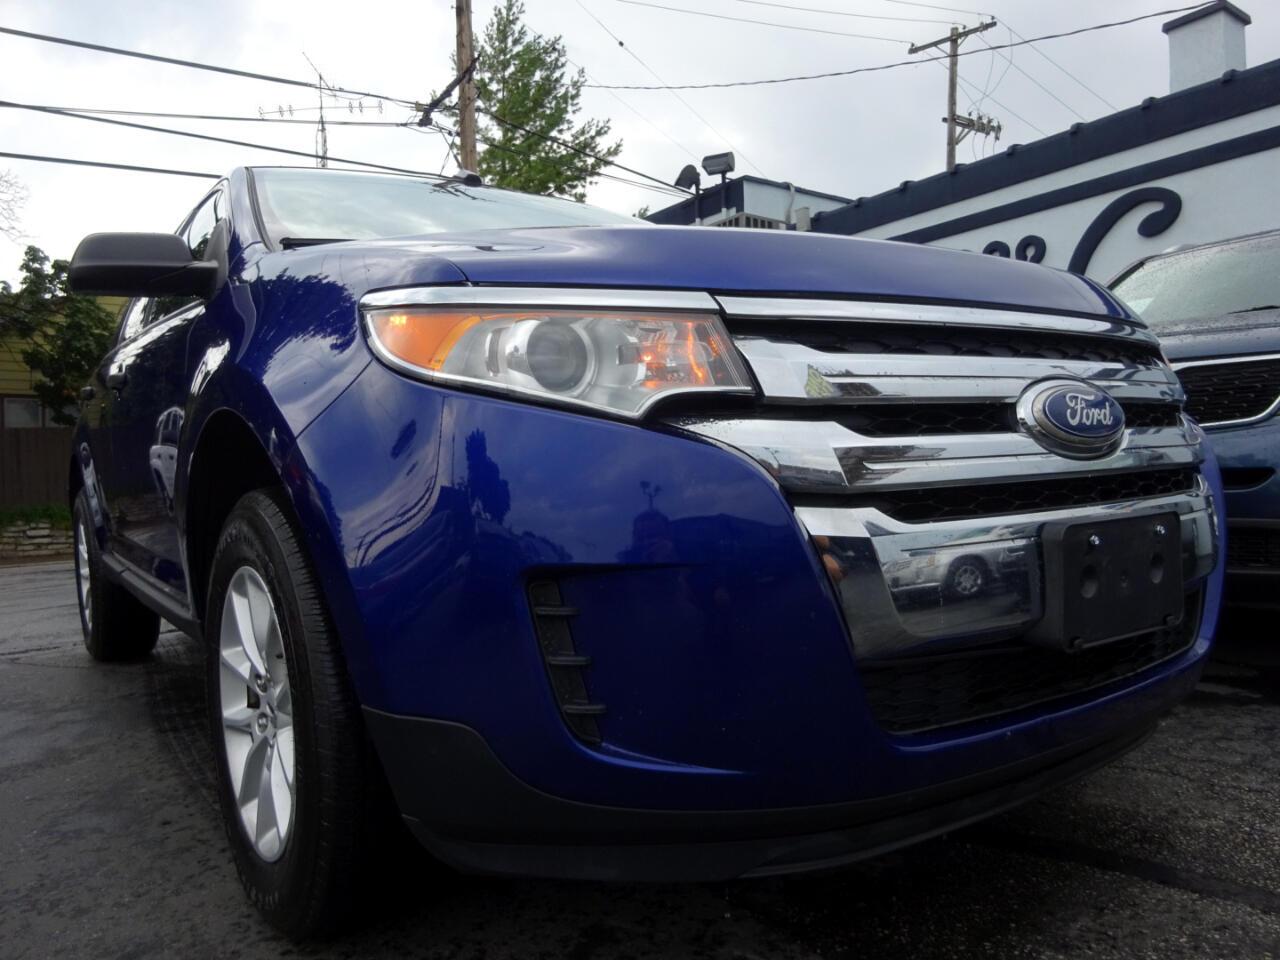 Ford Edge 4dr SE FWD 2014